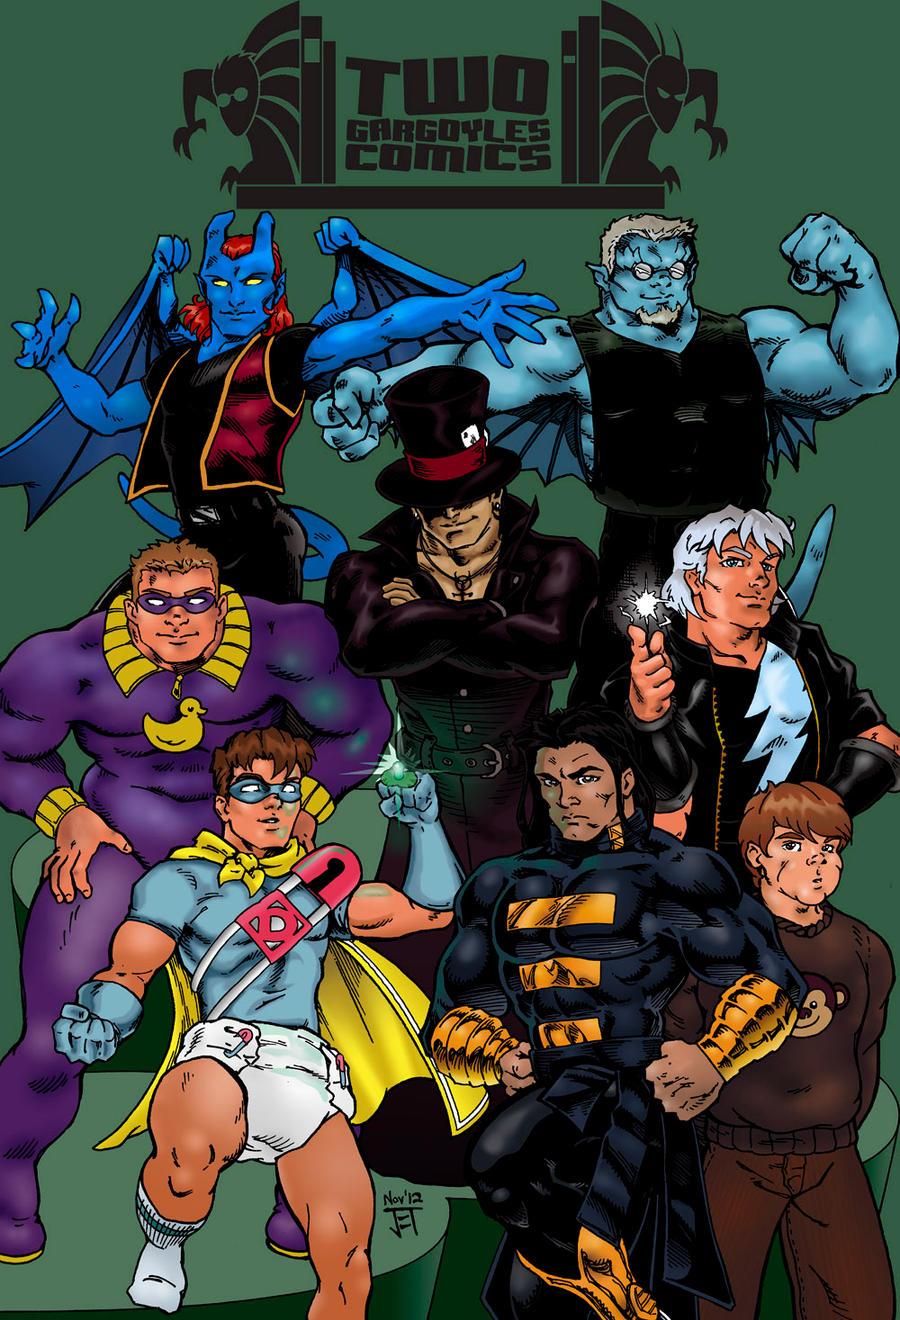 Twogargs Comics by jetcomics